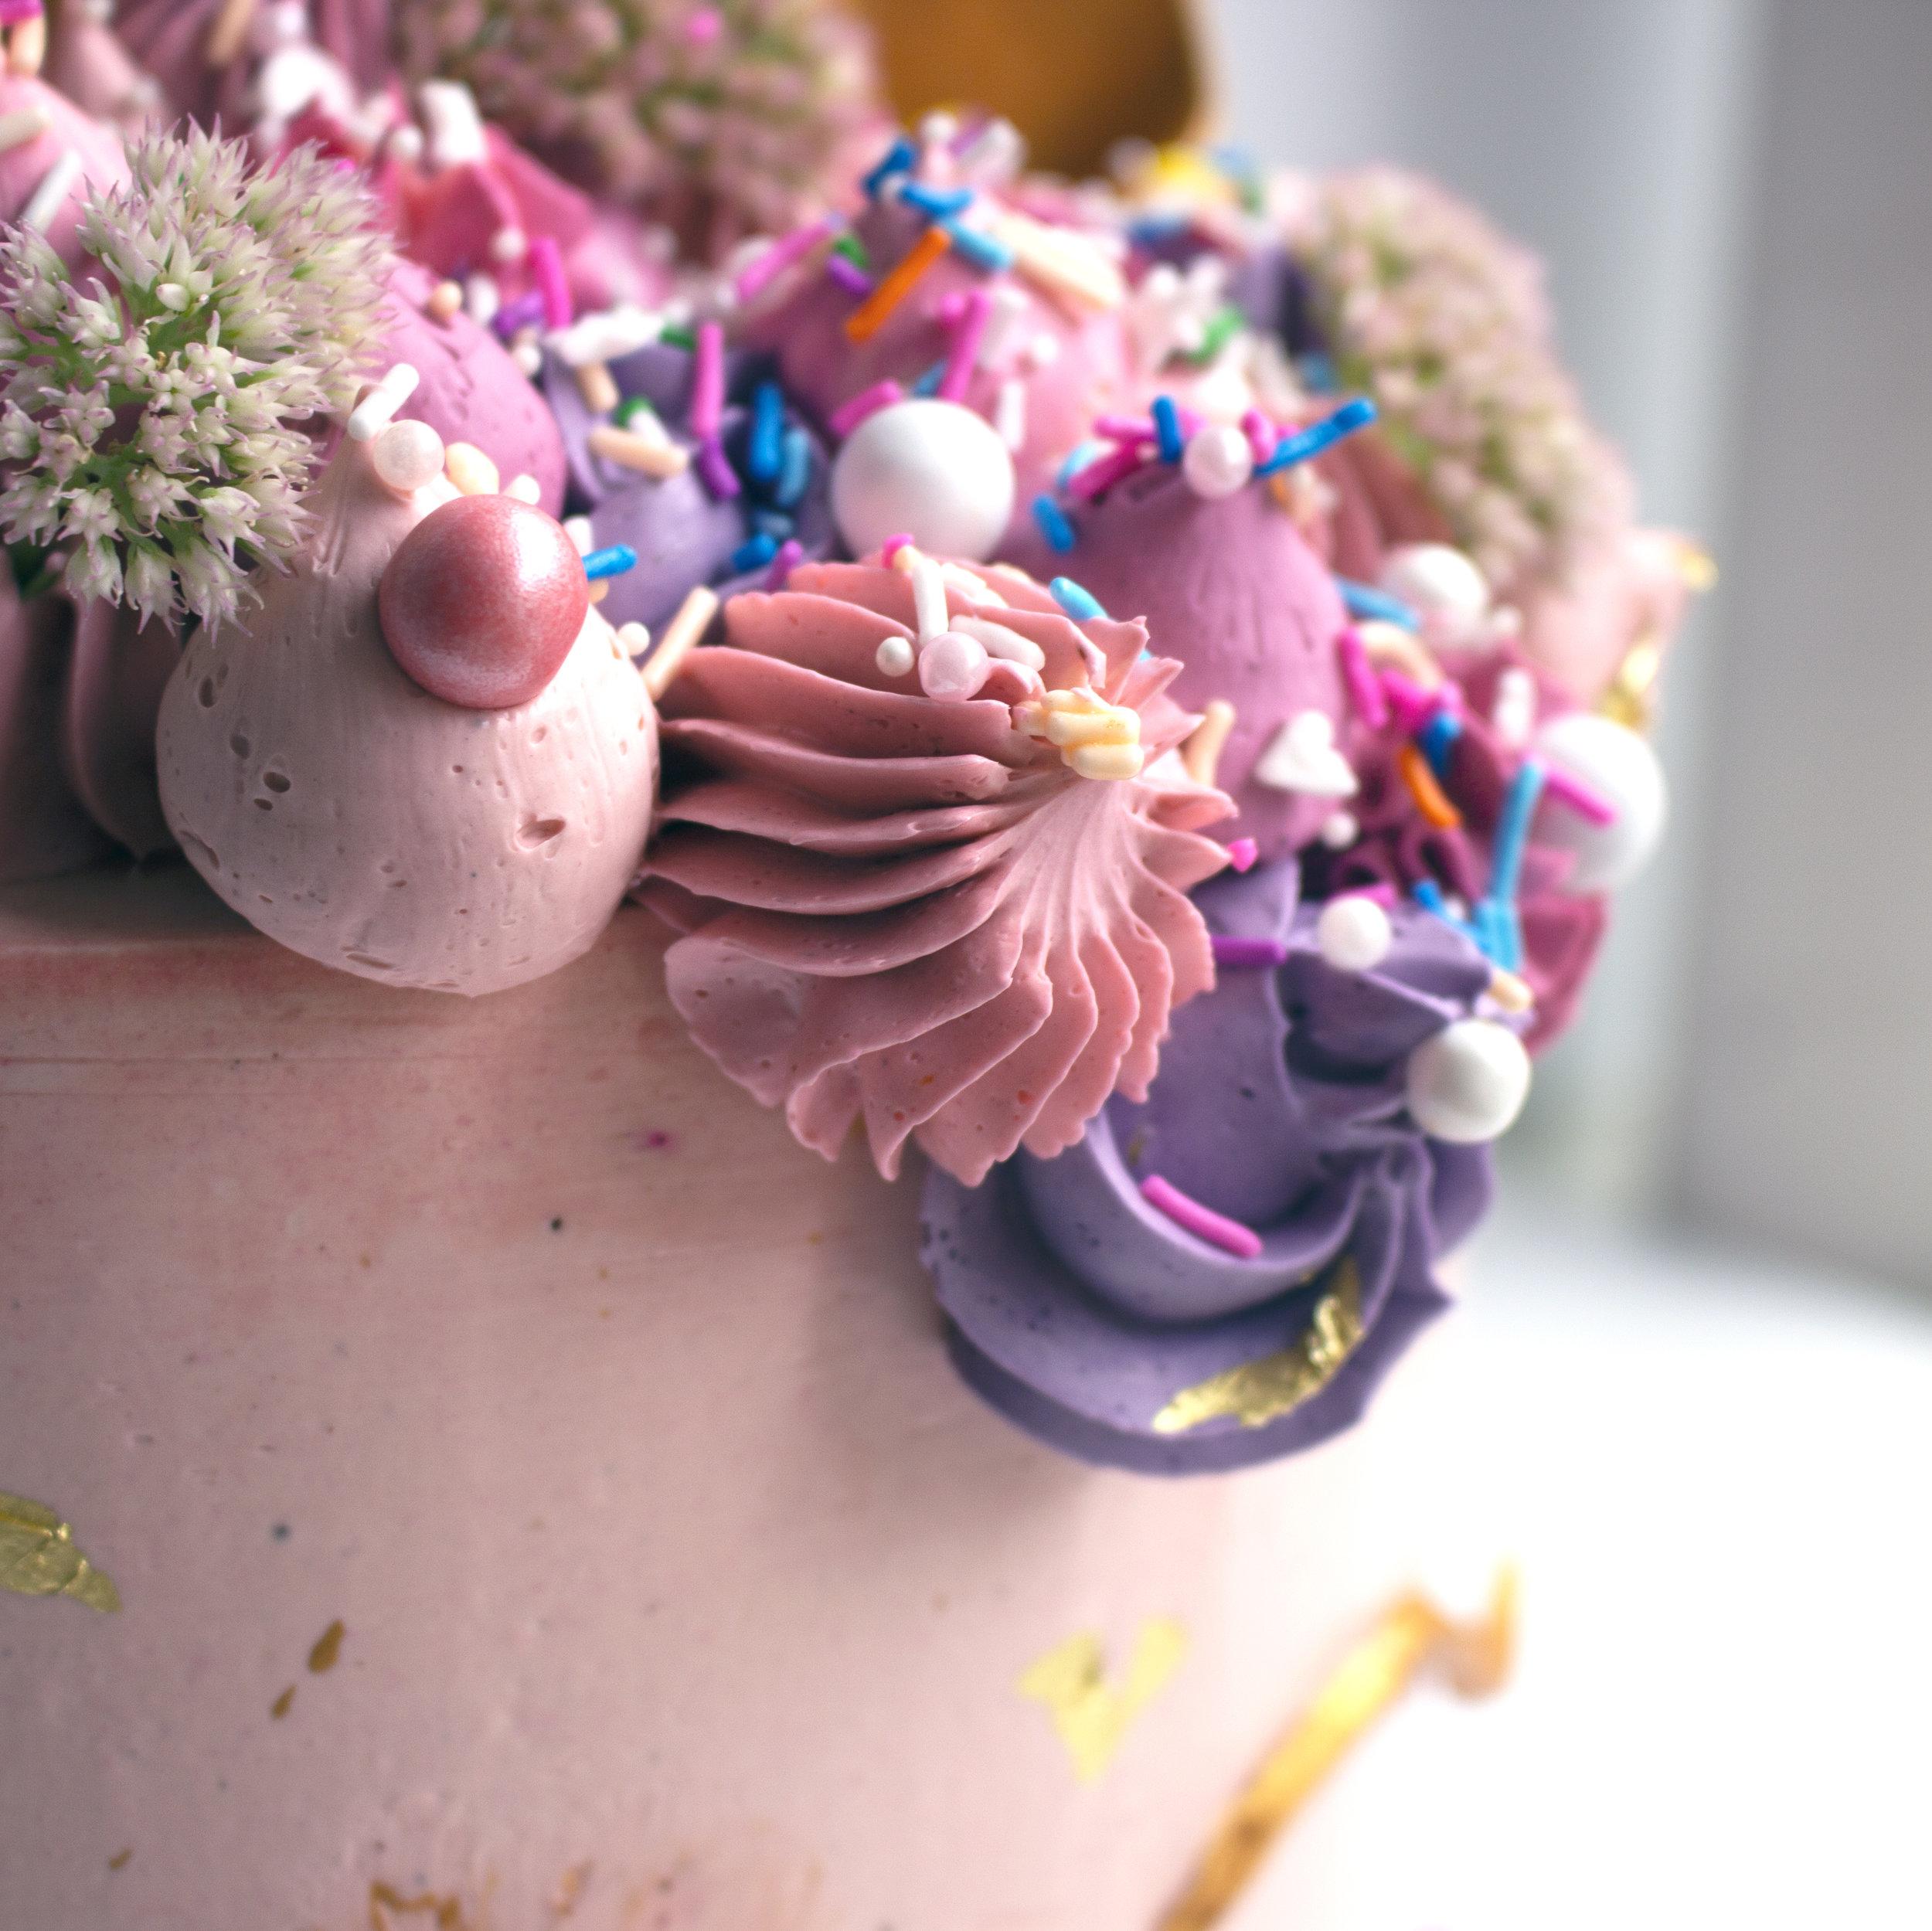 cake142.jpg